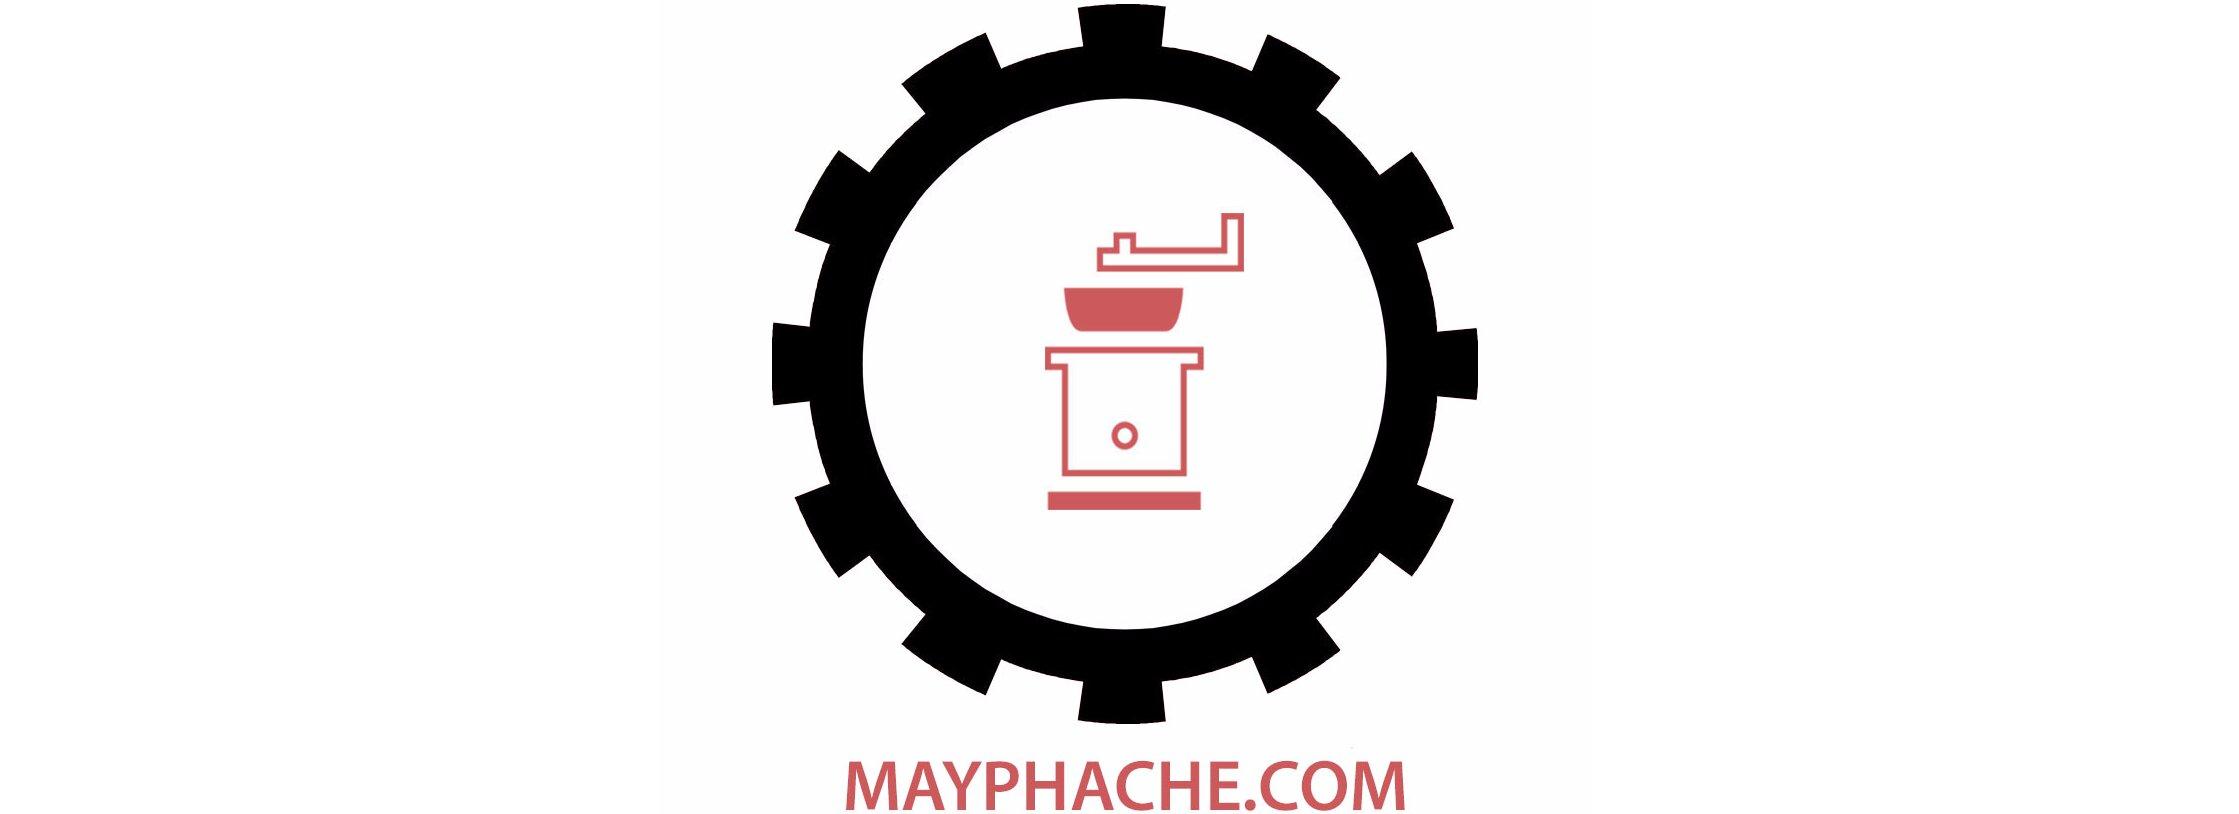 mayphache.com